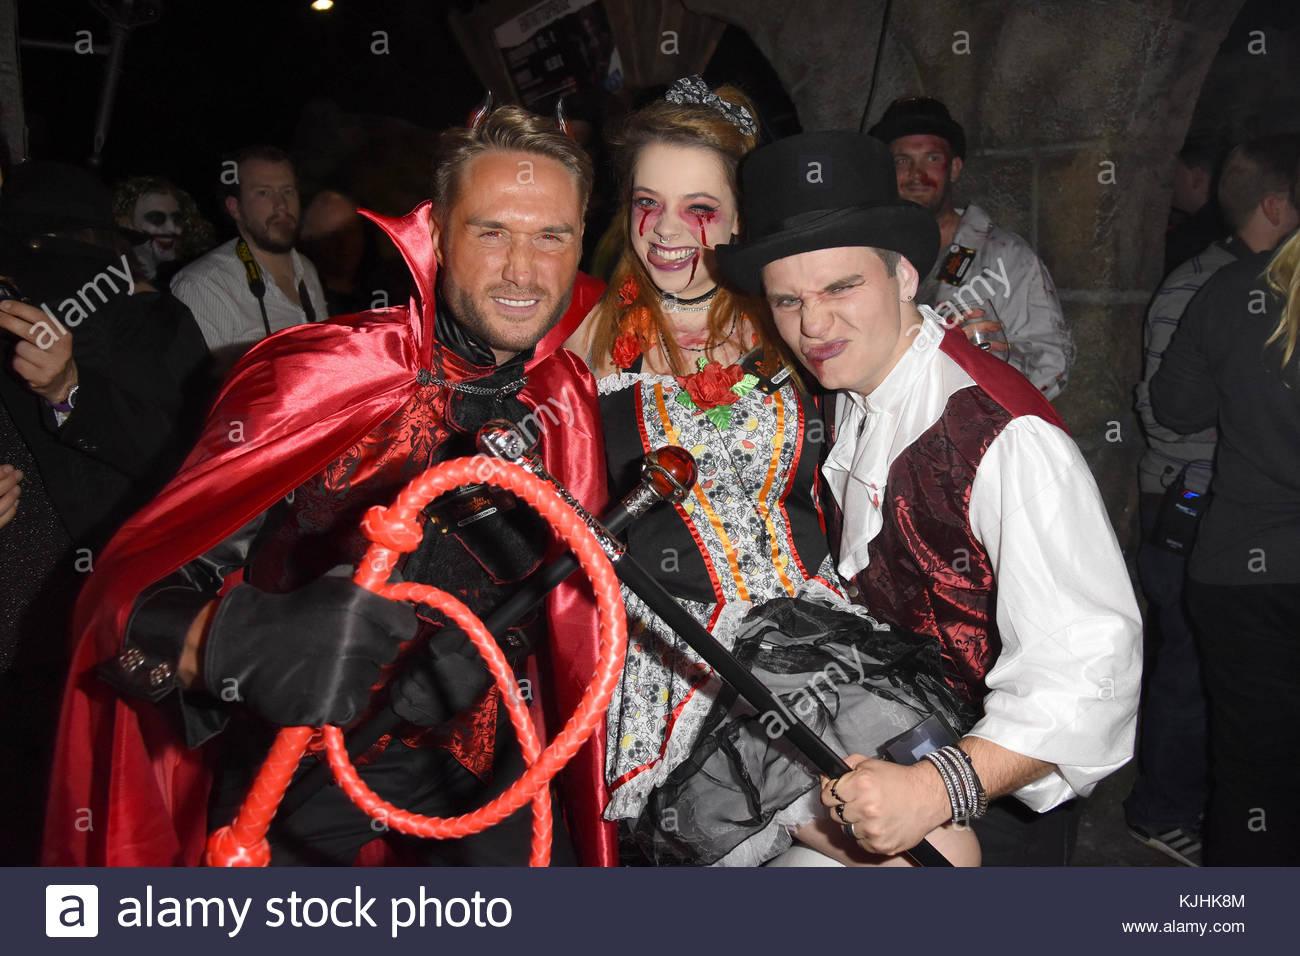 Halloween Party hosted by Natascha Ochsenknecht at Berlin Dungeon.  Featuring: Nico Schwanz, Anne Wuensche, Henning - Stock Image